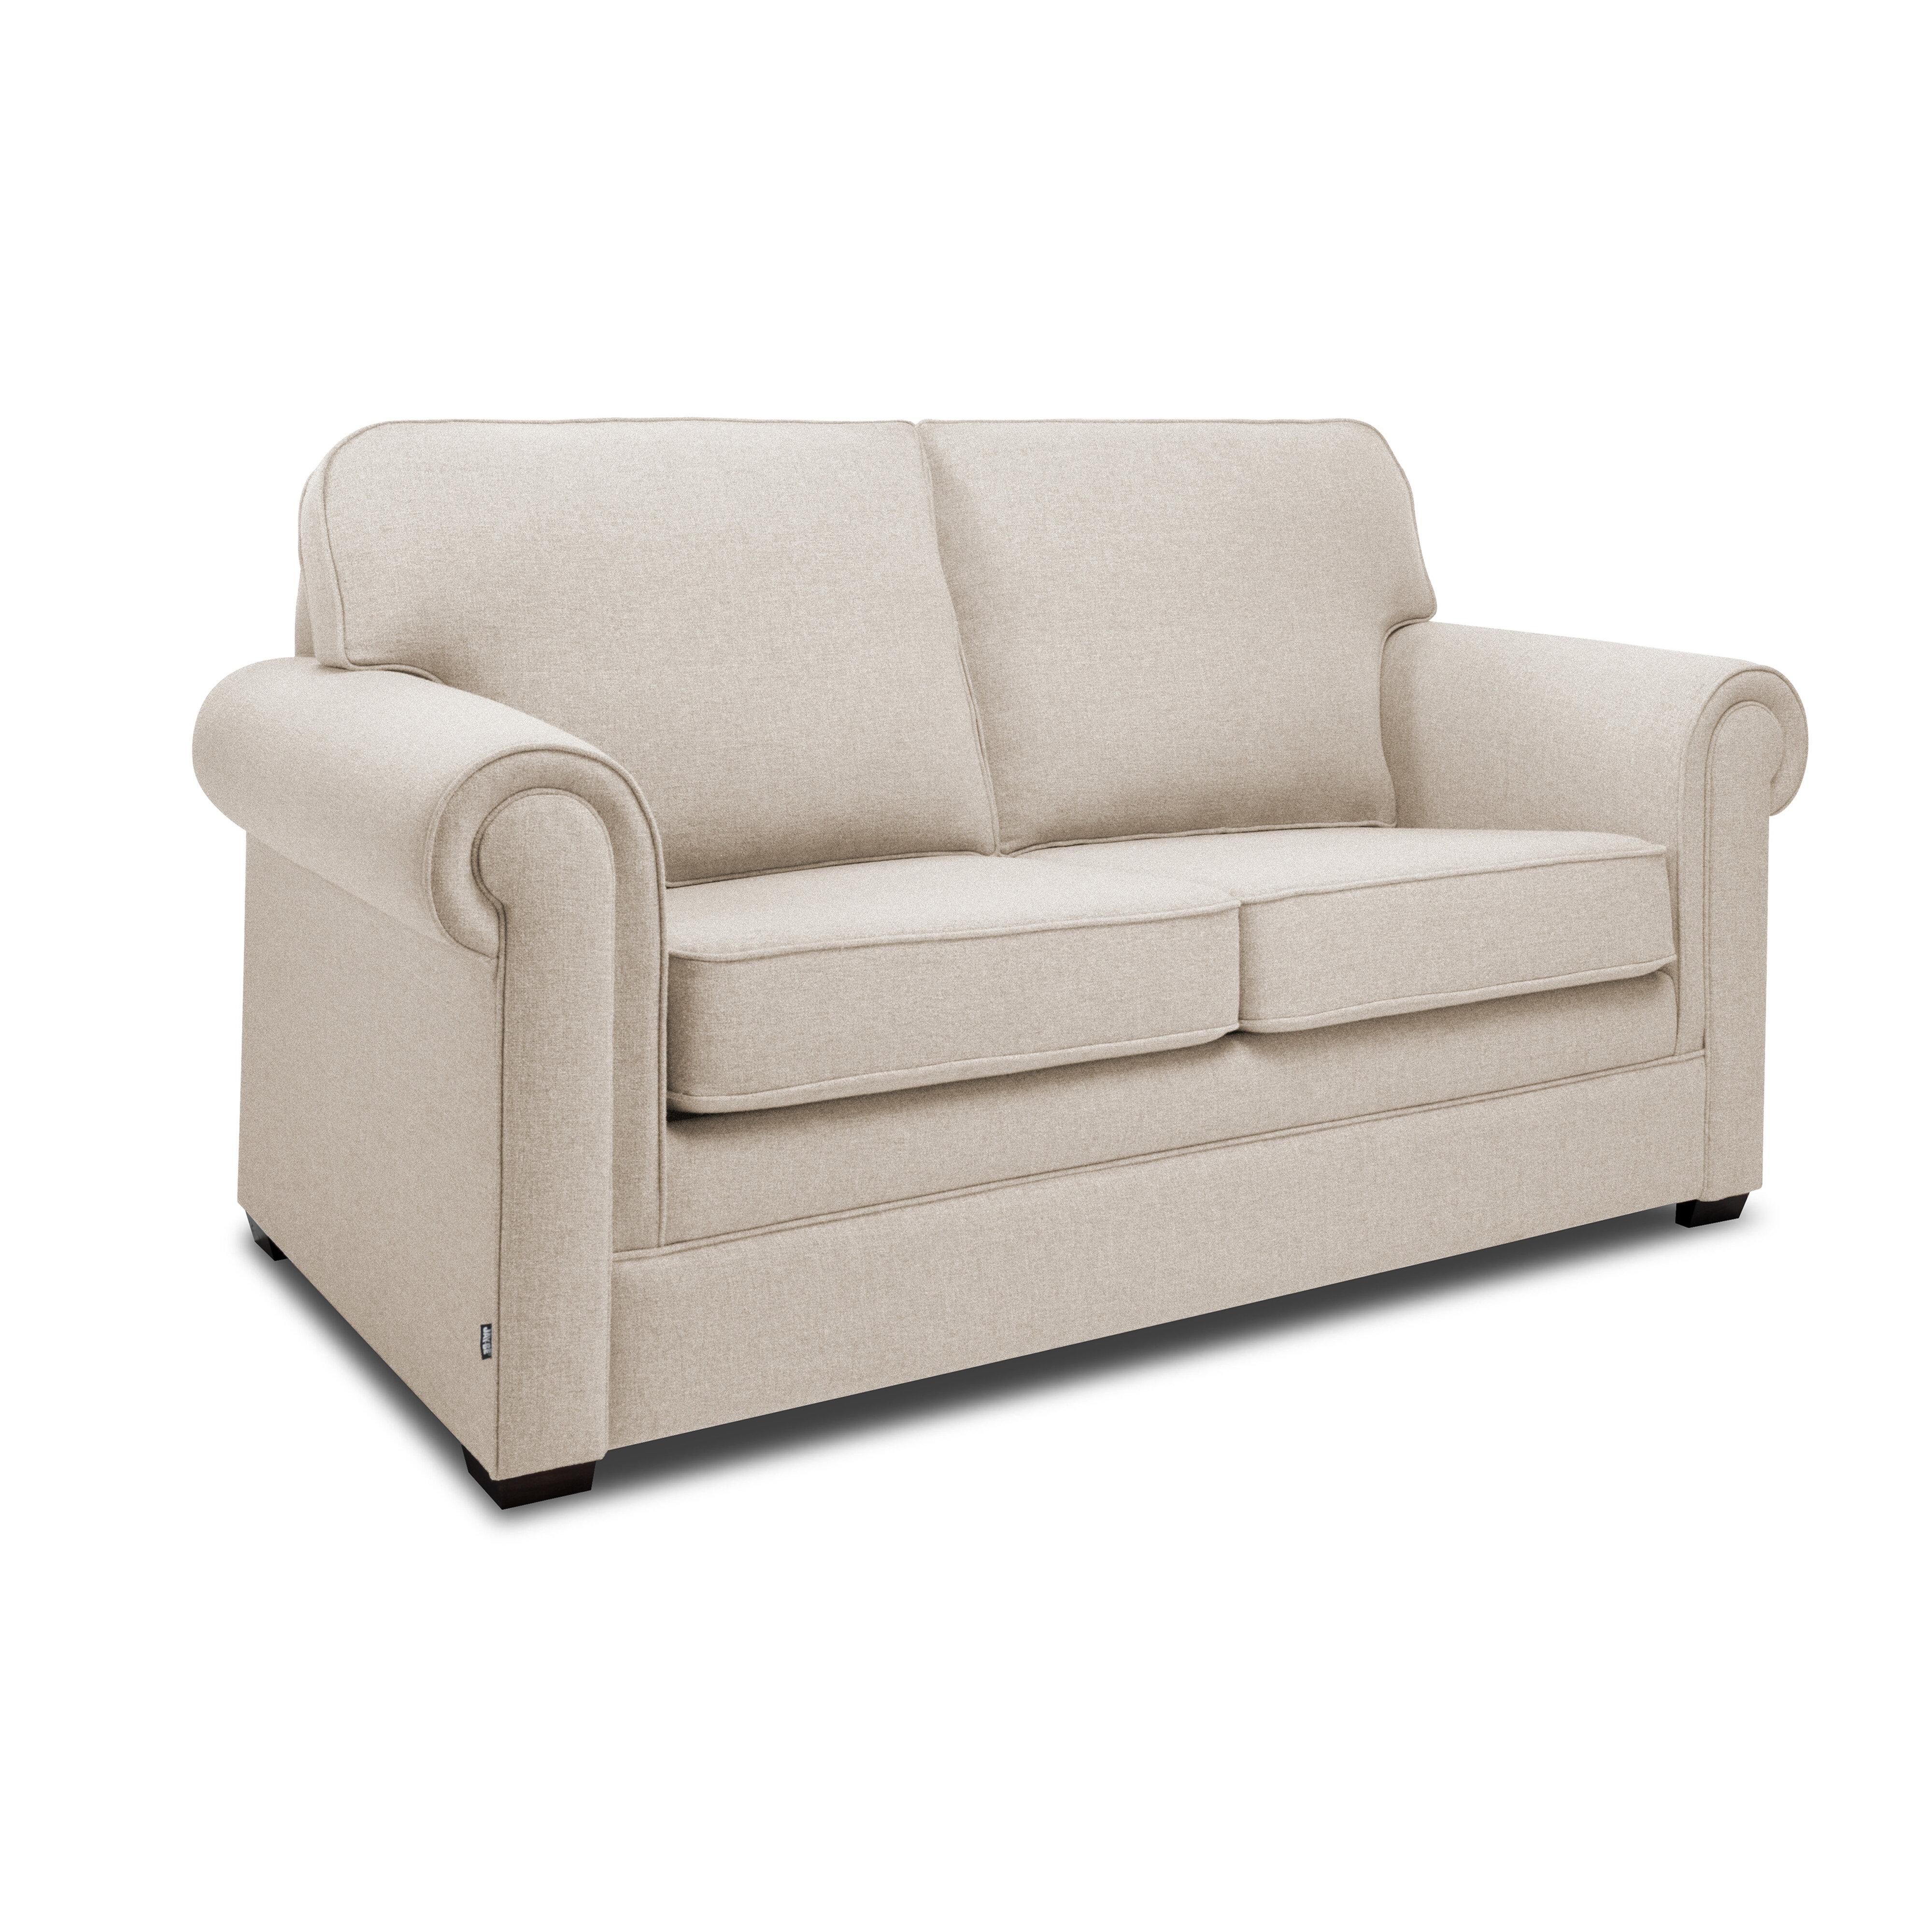 Jay-Be Classic Sofa 2 Seater Sofa Bed   Wayfair.co.uk